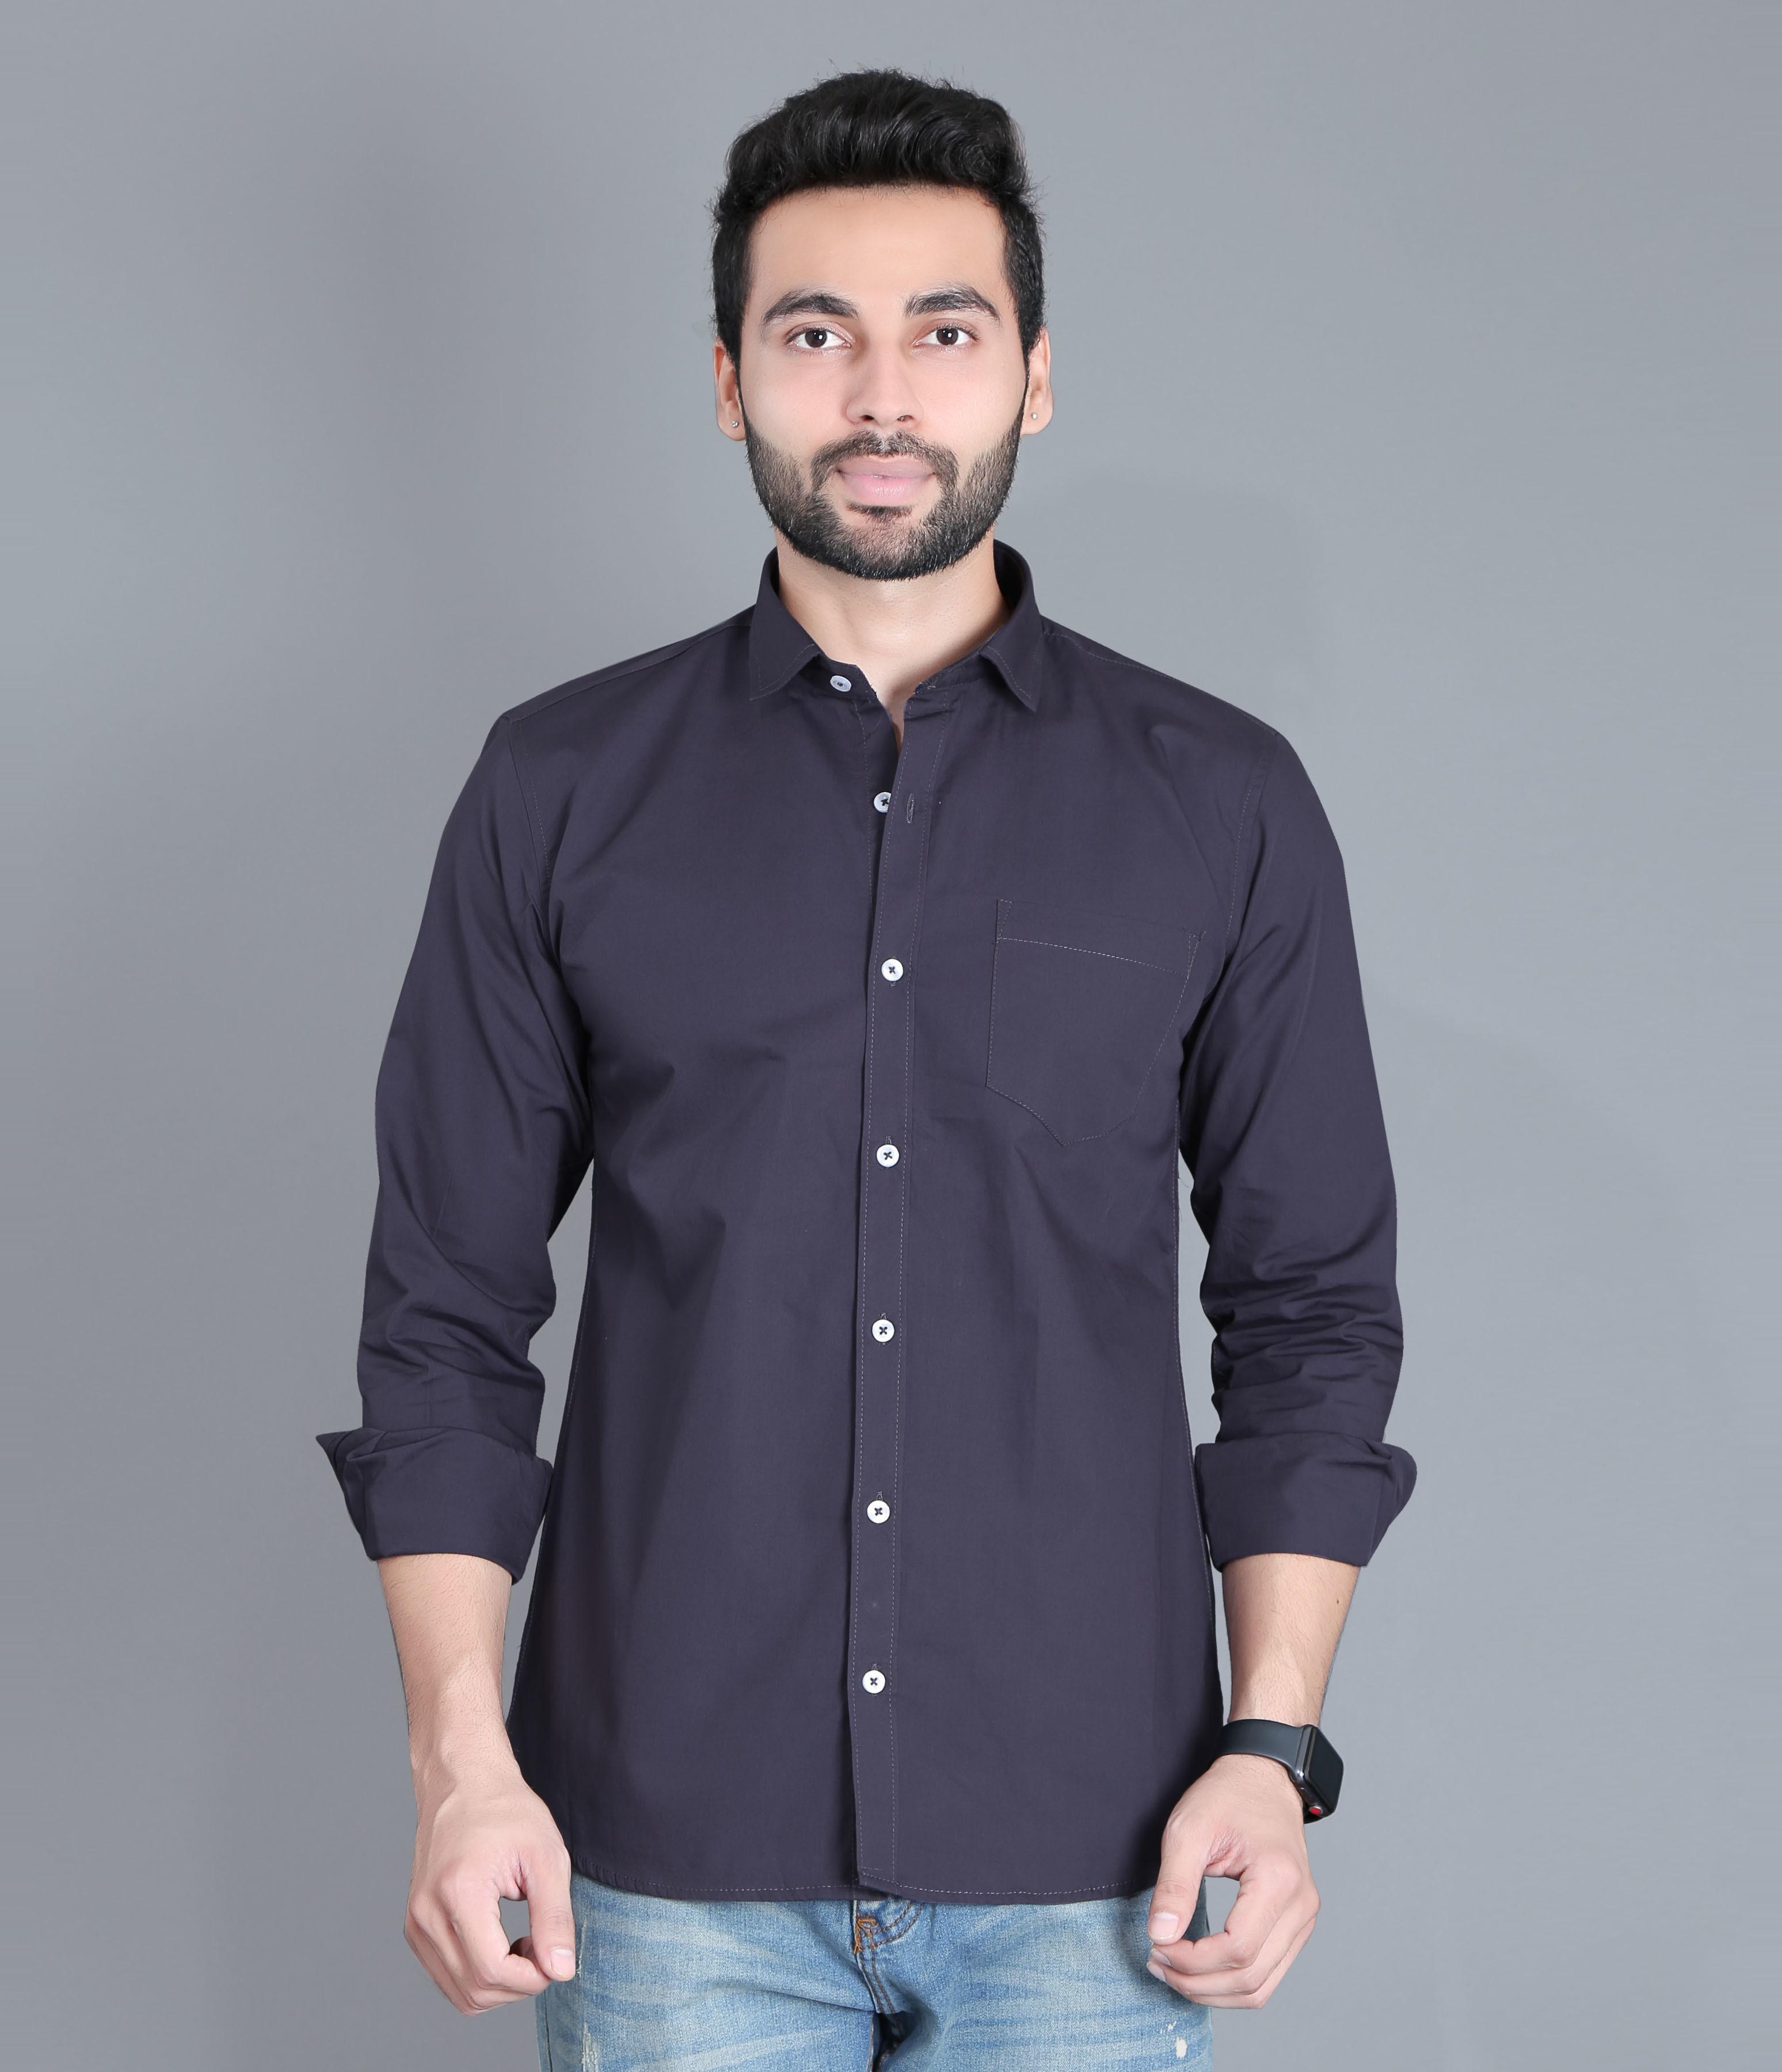 FIFTH ANFOLD Men's Dark Grey Casual Slim Collar Full/Long Sleev Slim Fit Shirt